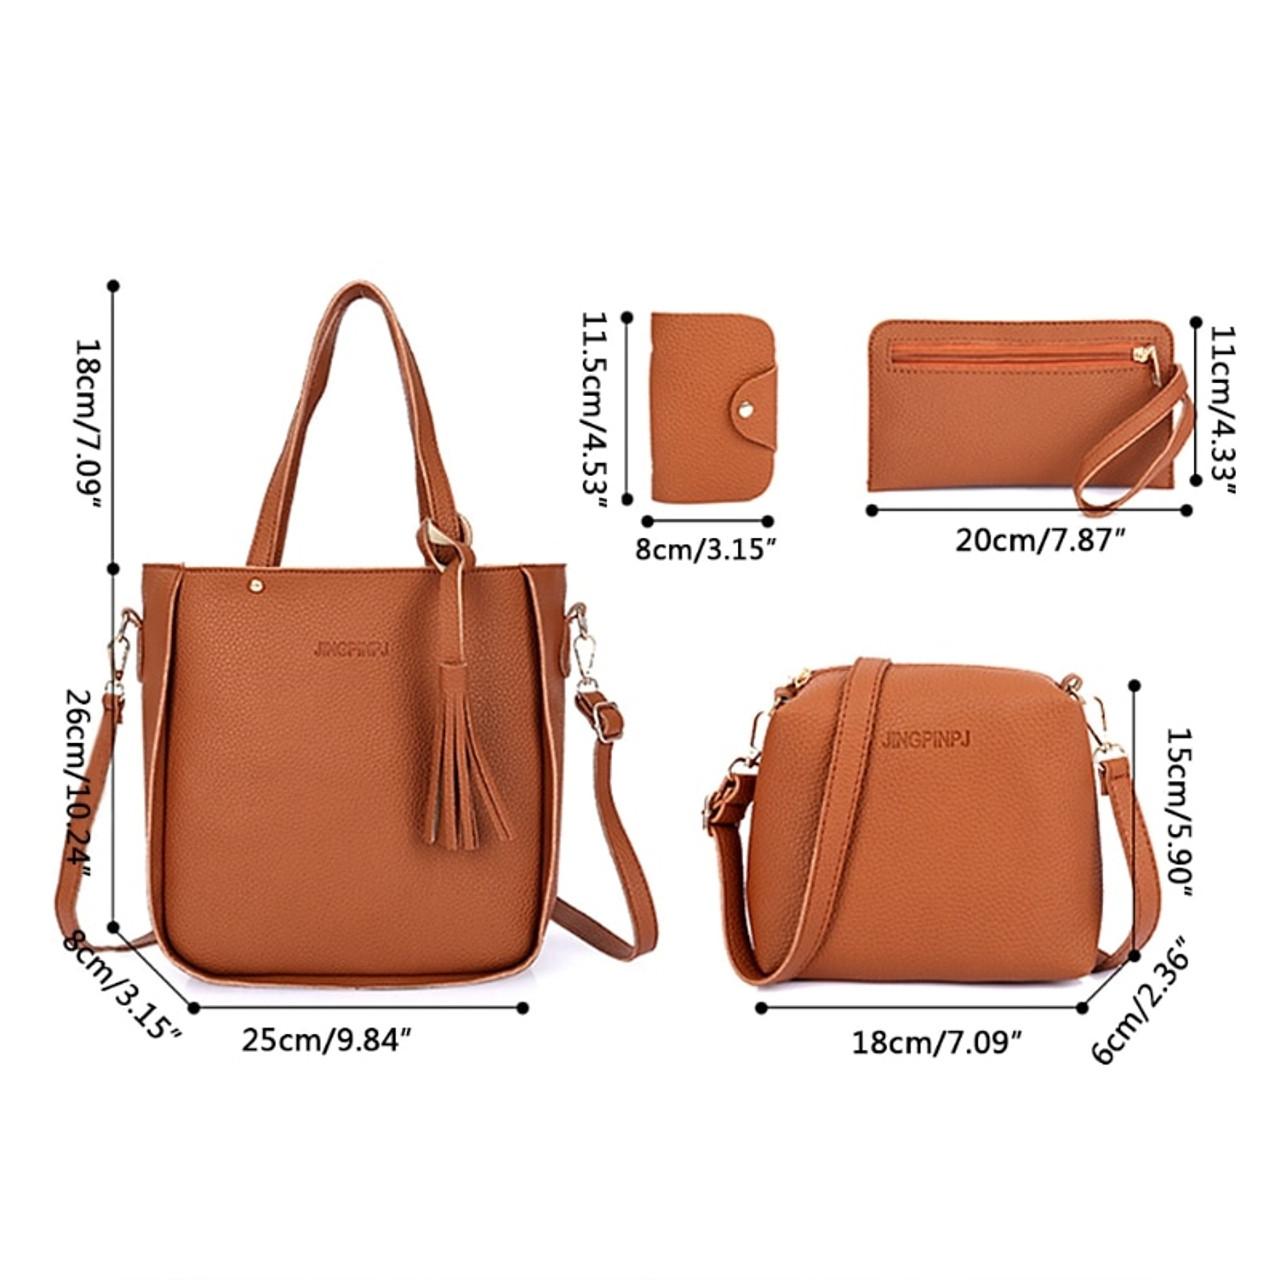 4pcs Fashion Women Lady Handbag Shoulder Bags Tote Purse Messenger Satchel Set